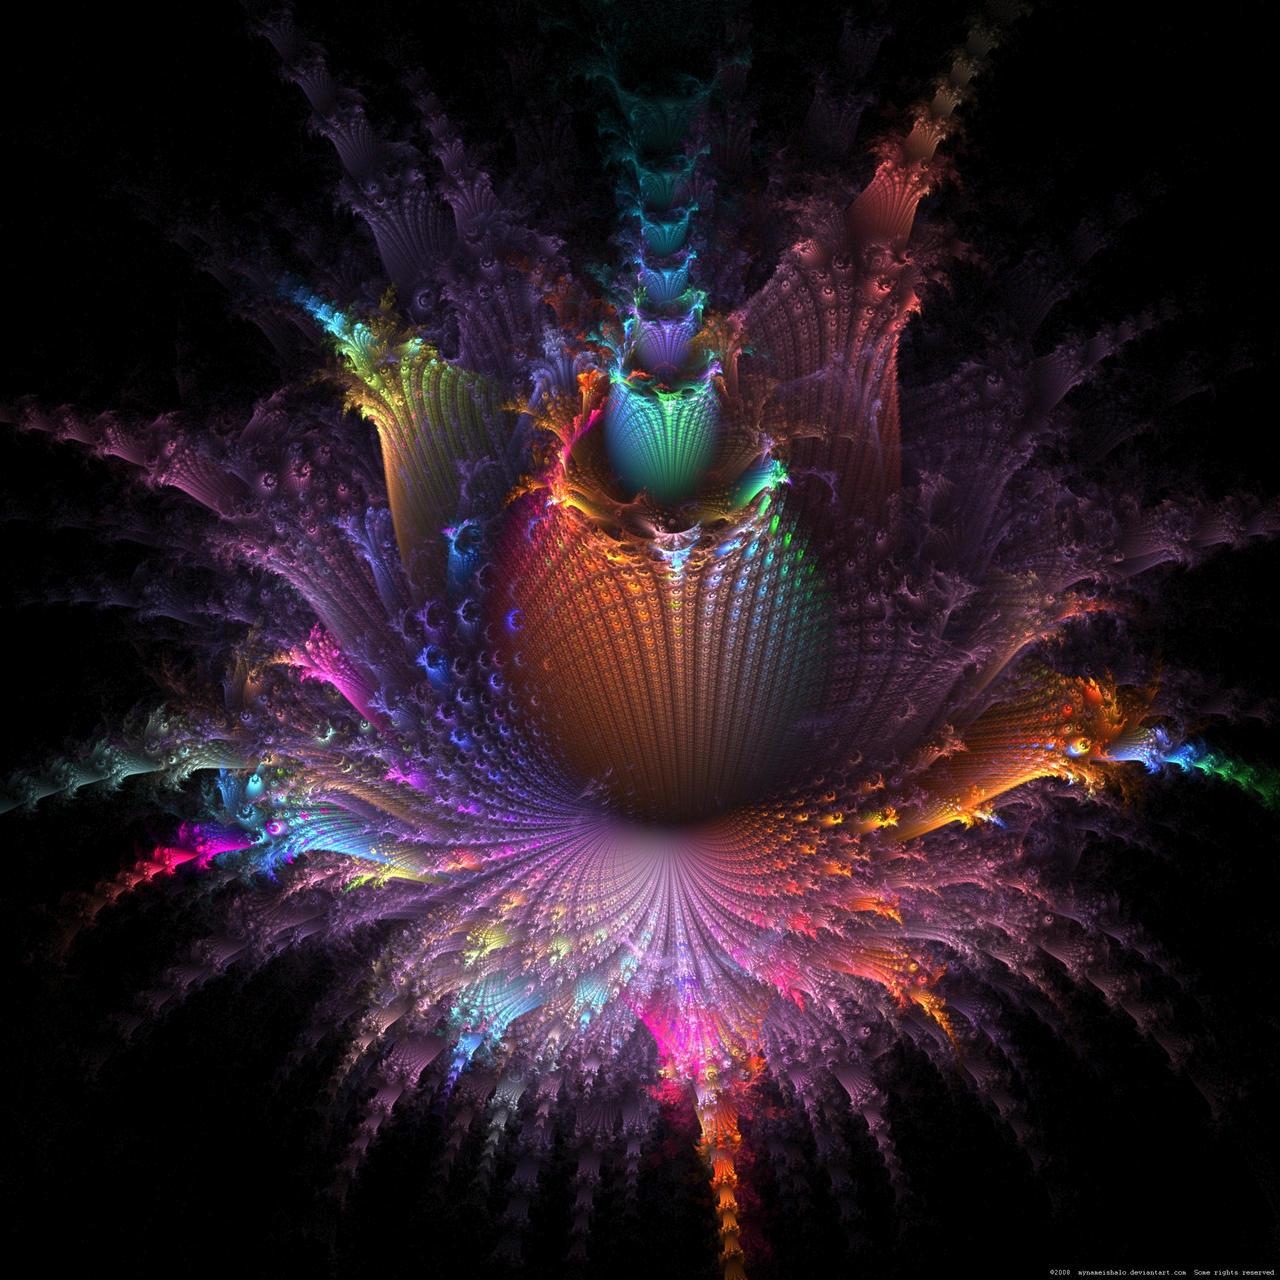 Fleur D apo by mynameishalo dans Divers Fleur_D__apo_by_mynameishalo